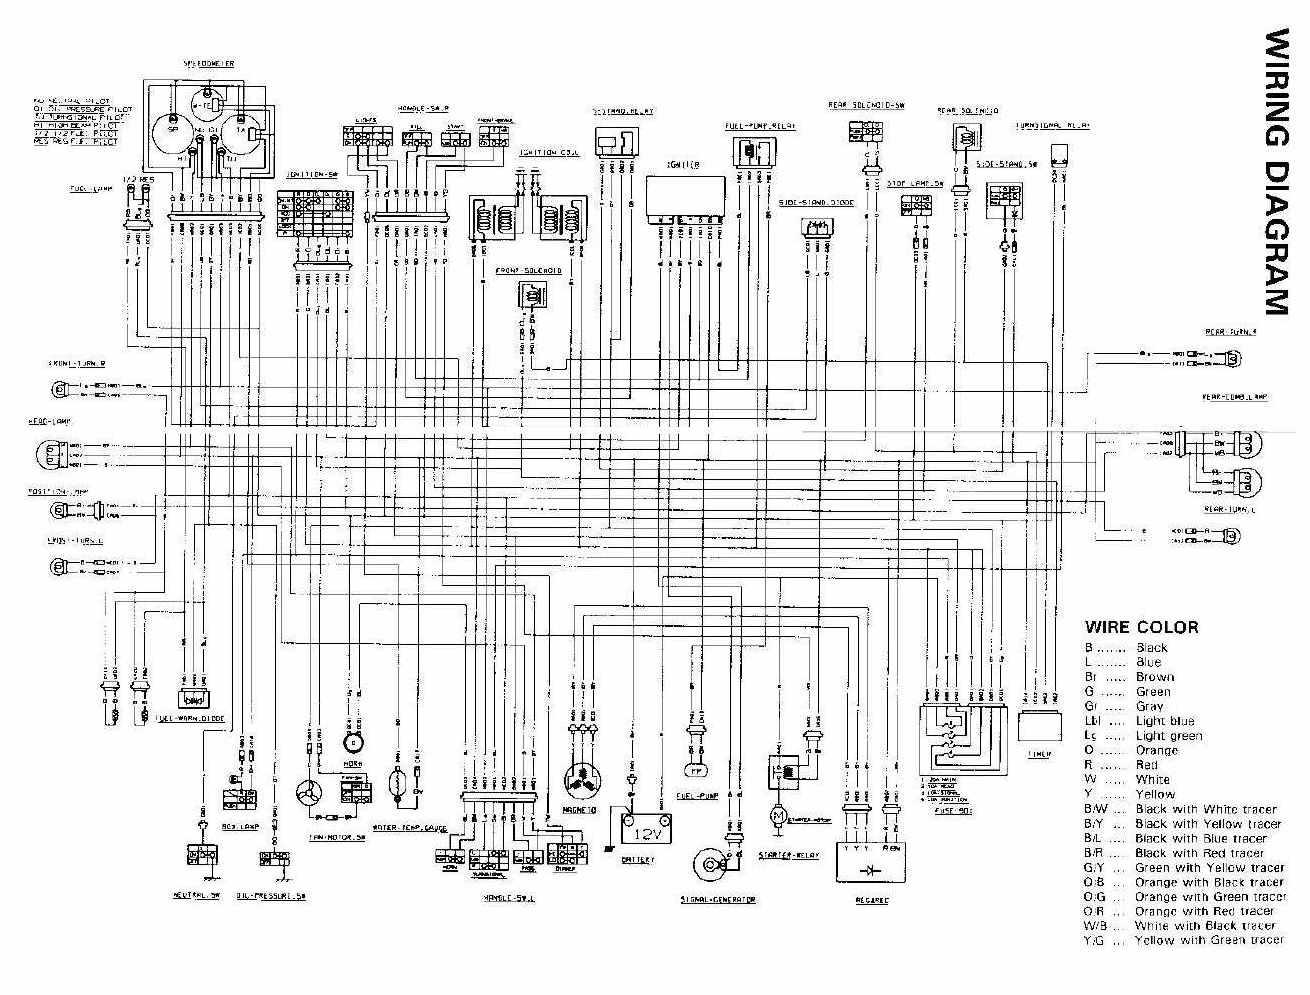 1987 Suzuki Gsxr Wiring Diagram   wiring diagram    conductor-delta.latinacoupon.it   Gsxr 1100 Wiring Diagram      wiring diagram